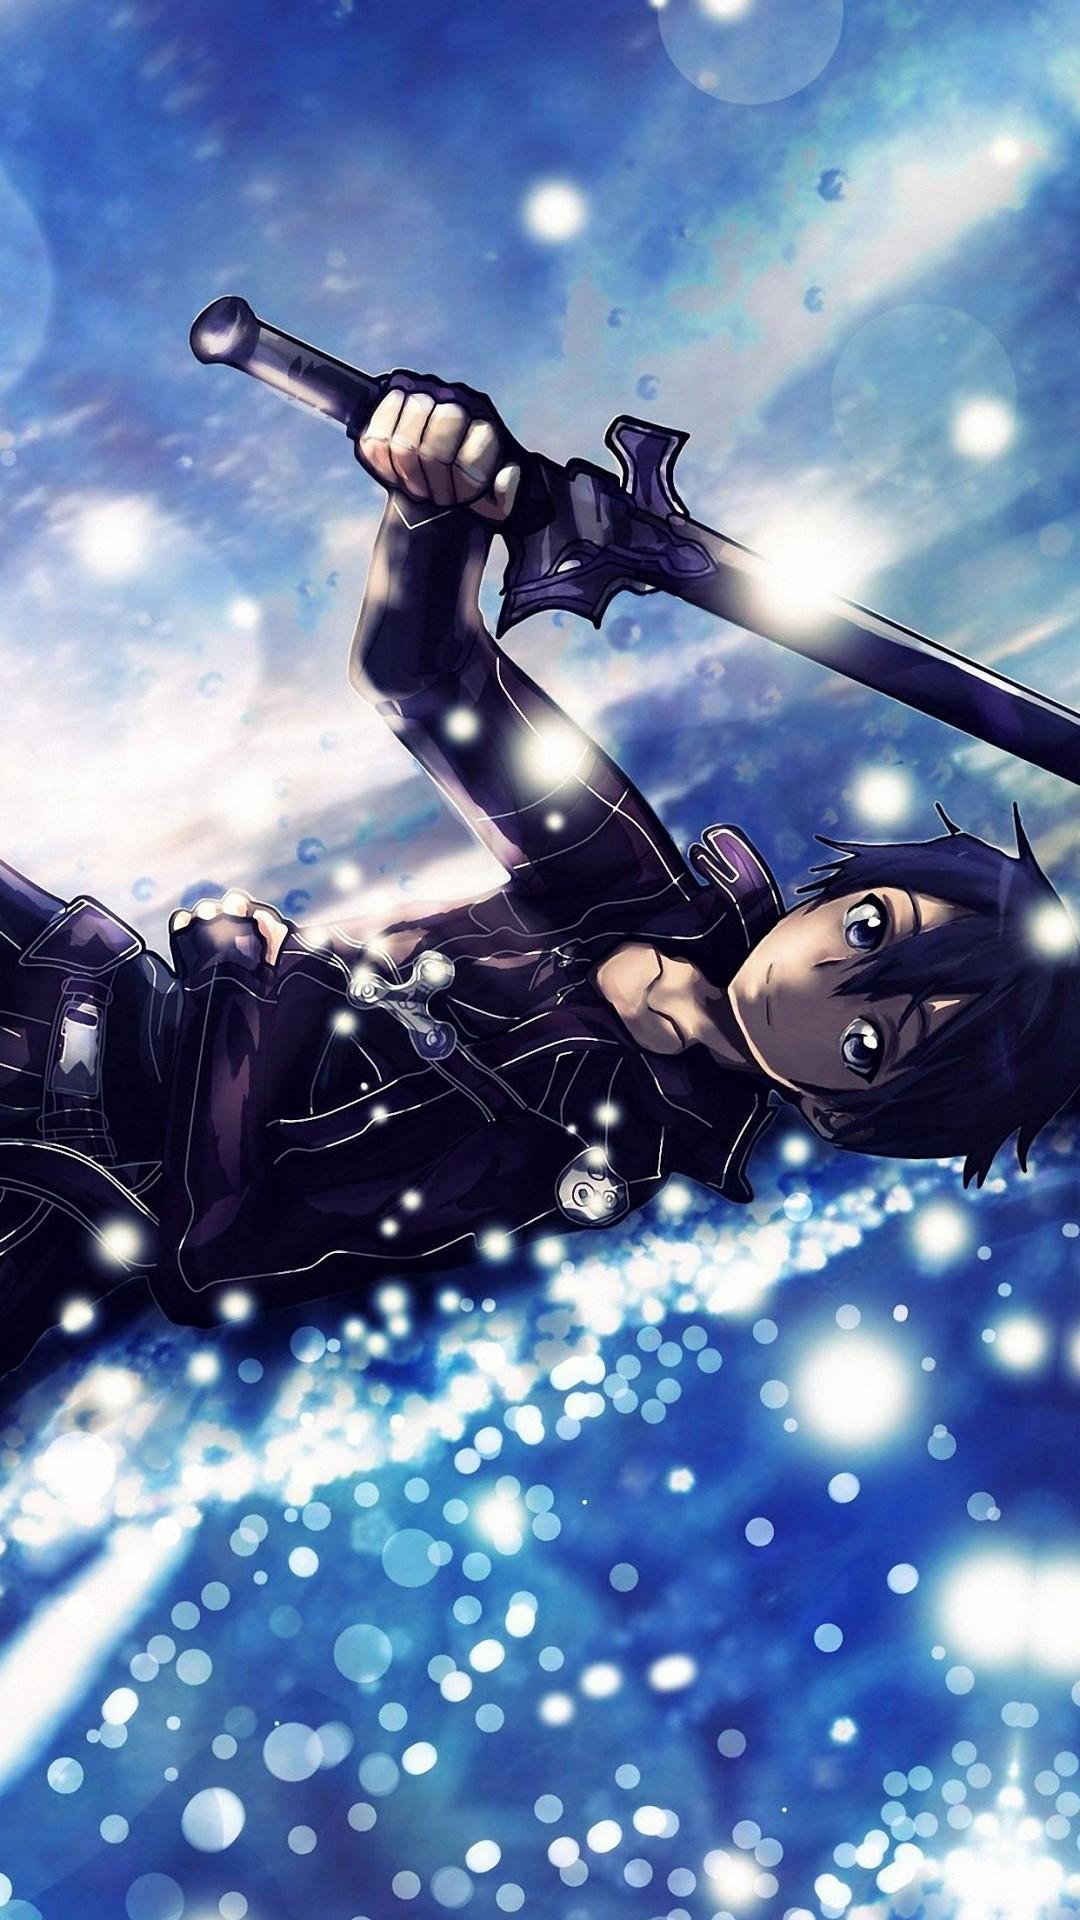 kirito – sword art online iPhone 6s / Plus wallpapers HD